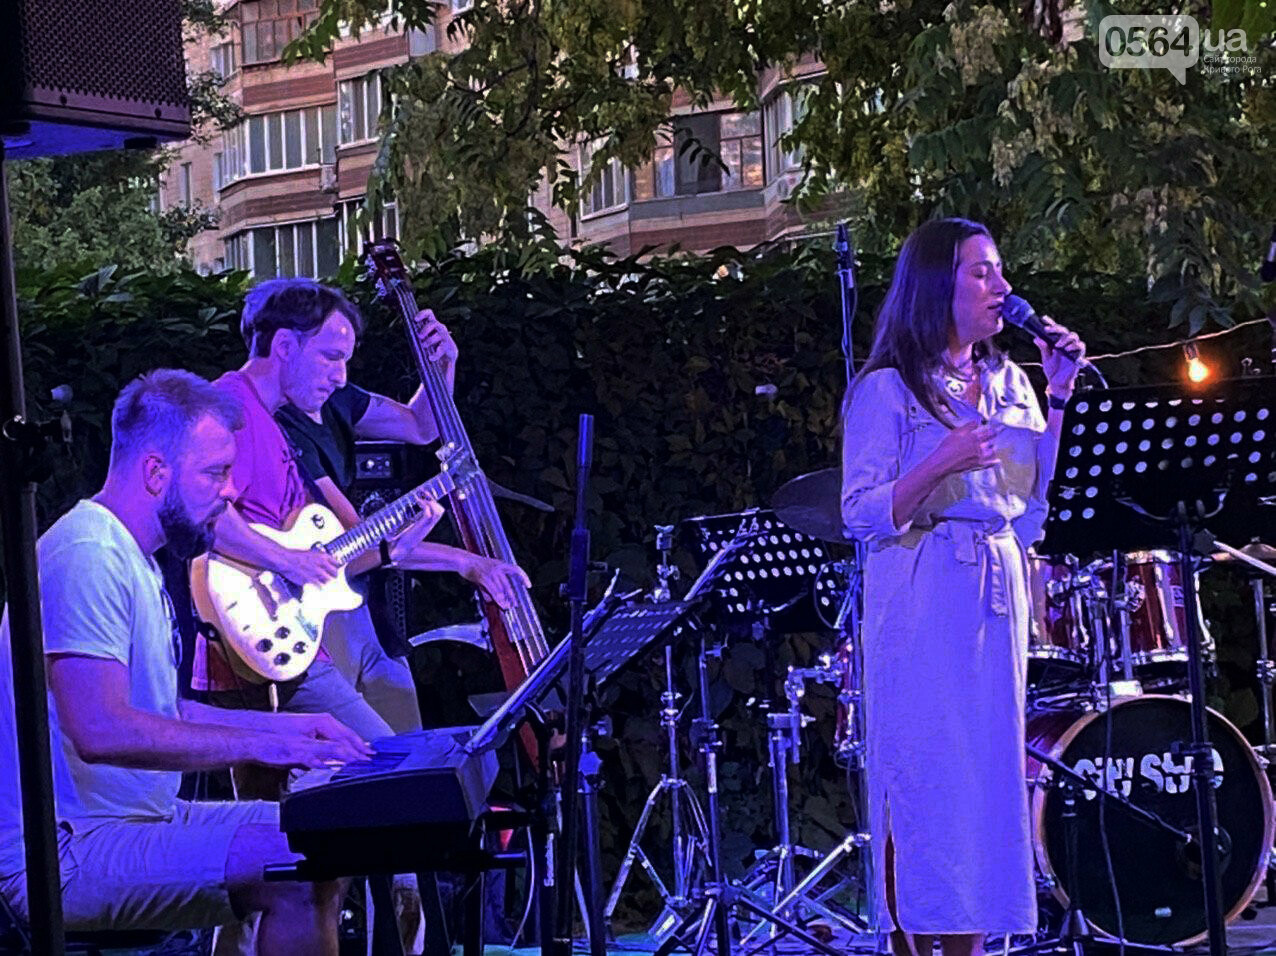 Под звездным небом криворожане наслаждались летним джазом от  Advantage Project, - ФОТО, ВИДЕО , фото-17